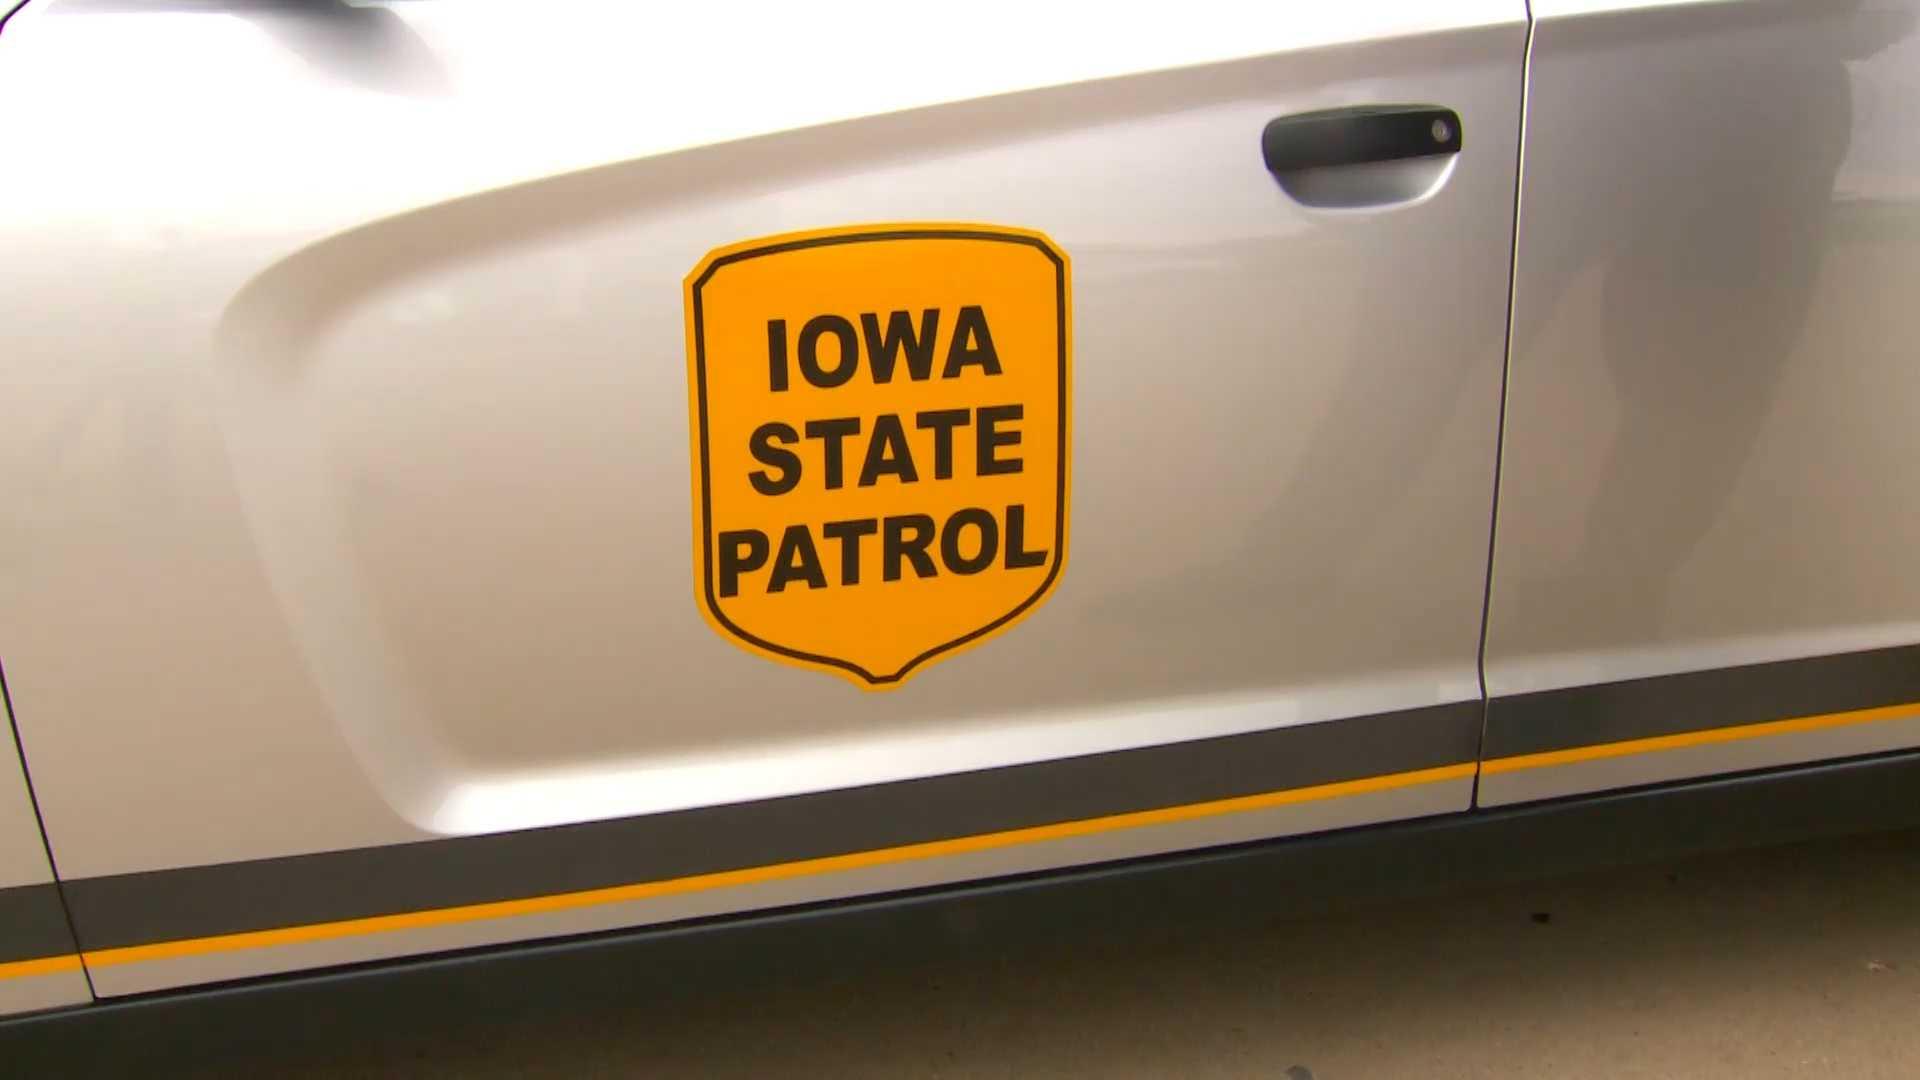 iowa state patrol.jpg